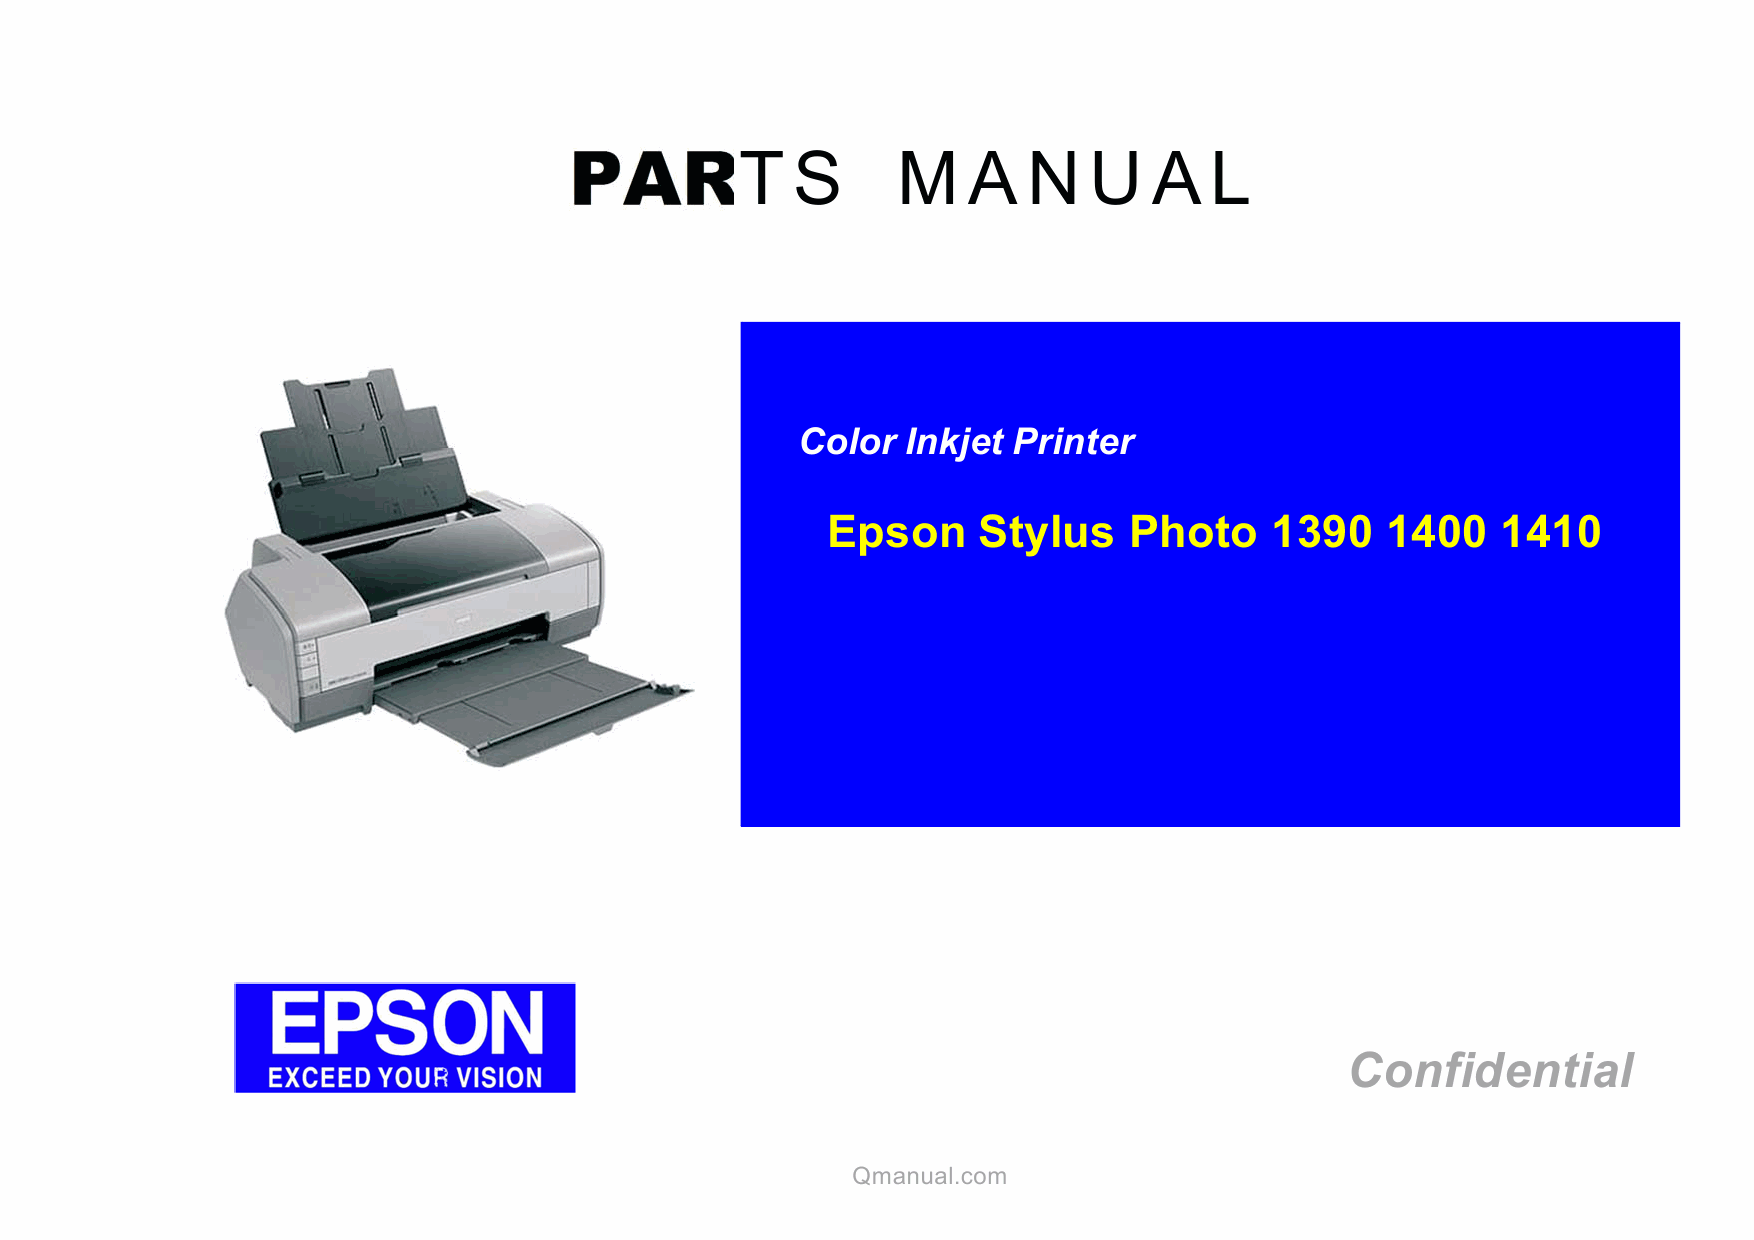 Epson stylusphoto 1390 1400 1410 parts manual.